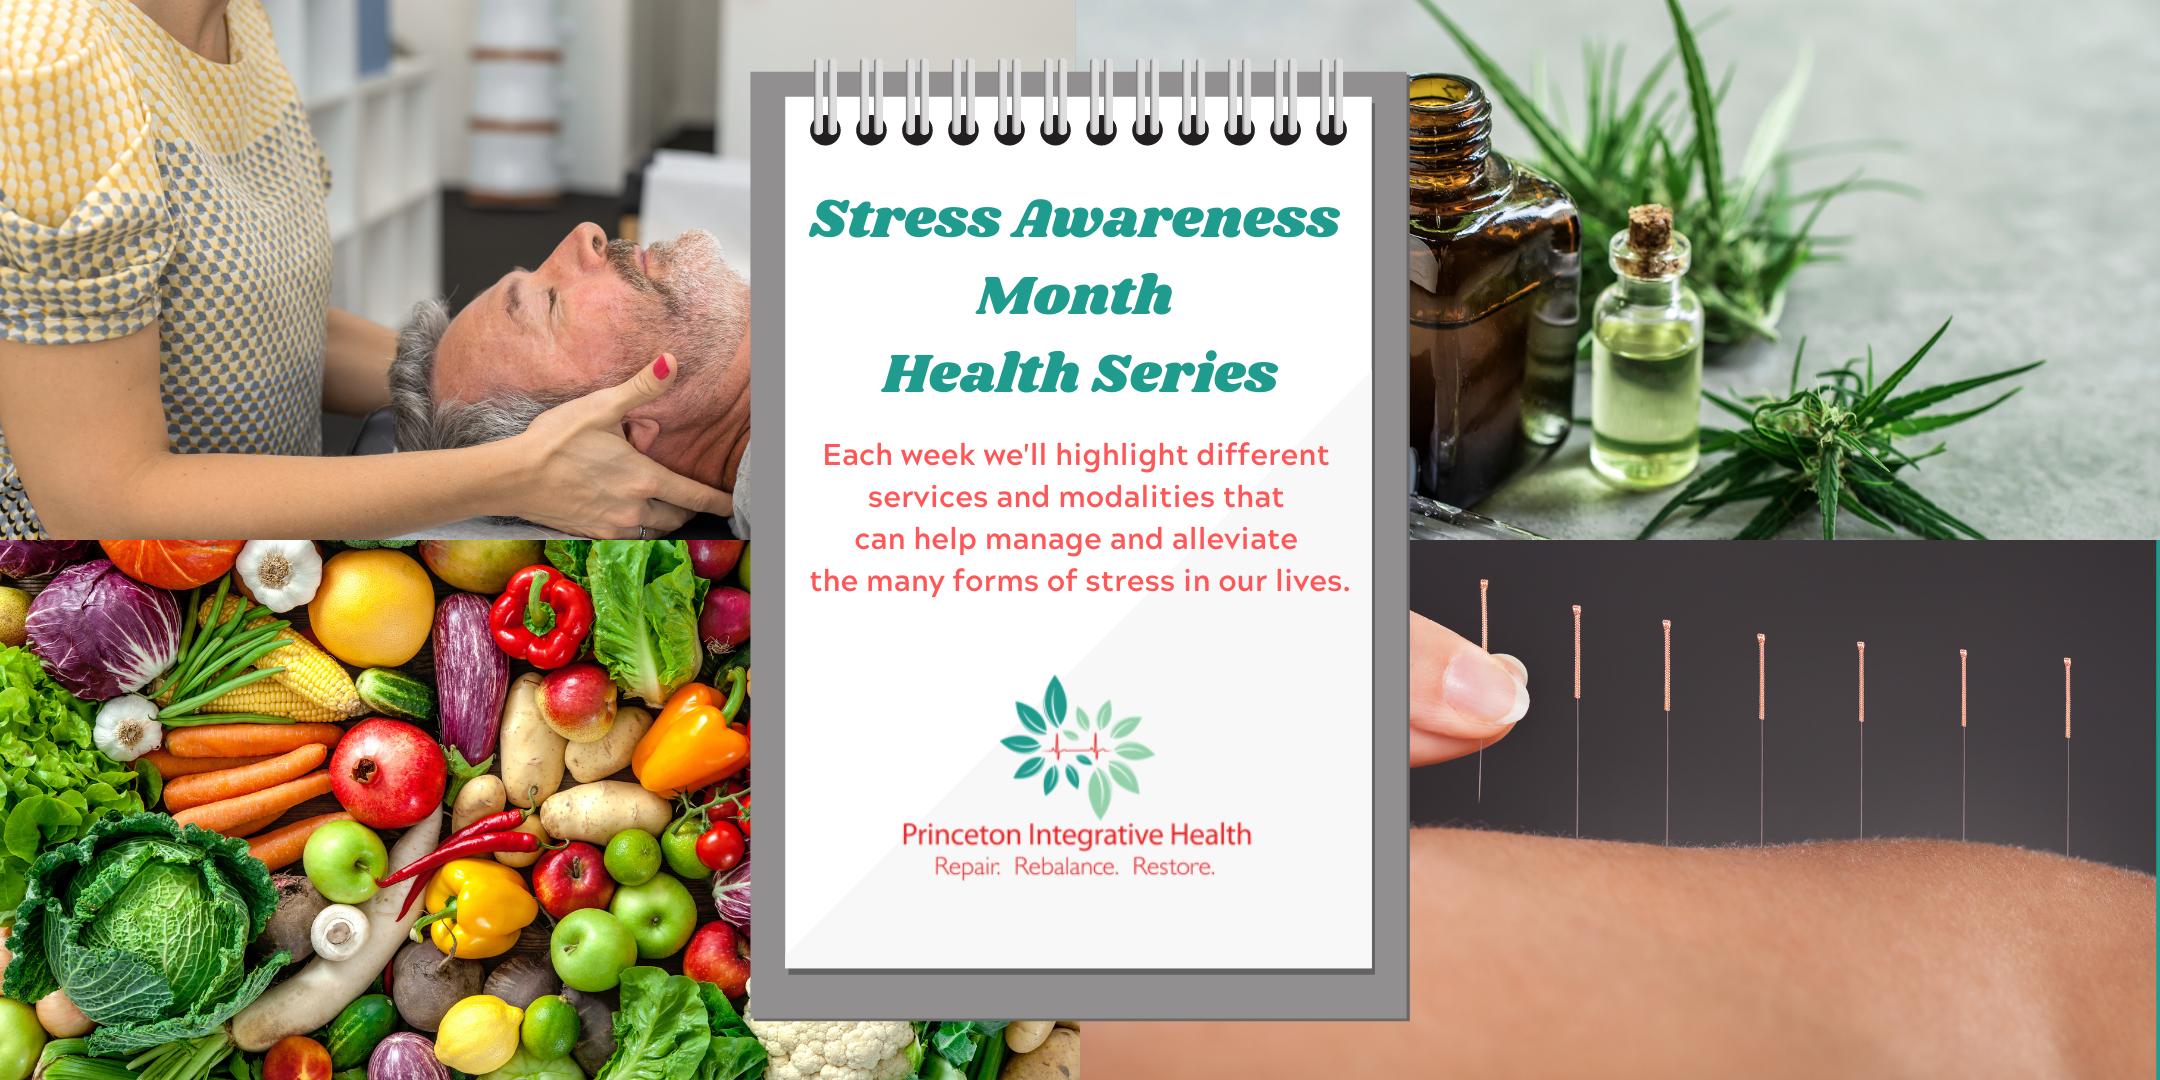 StressAwarenessMonth